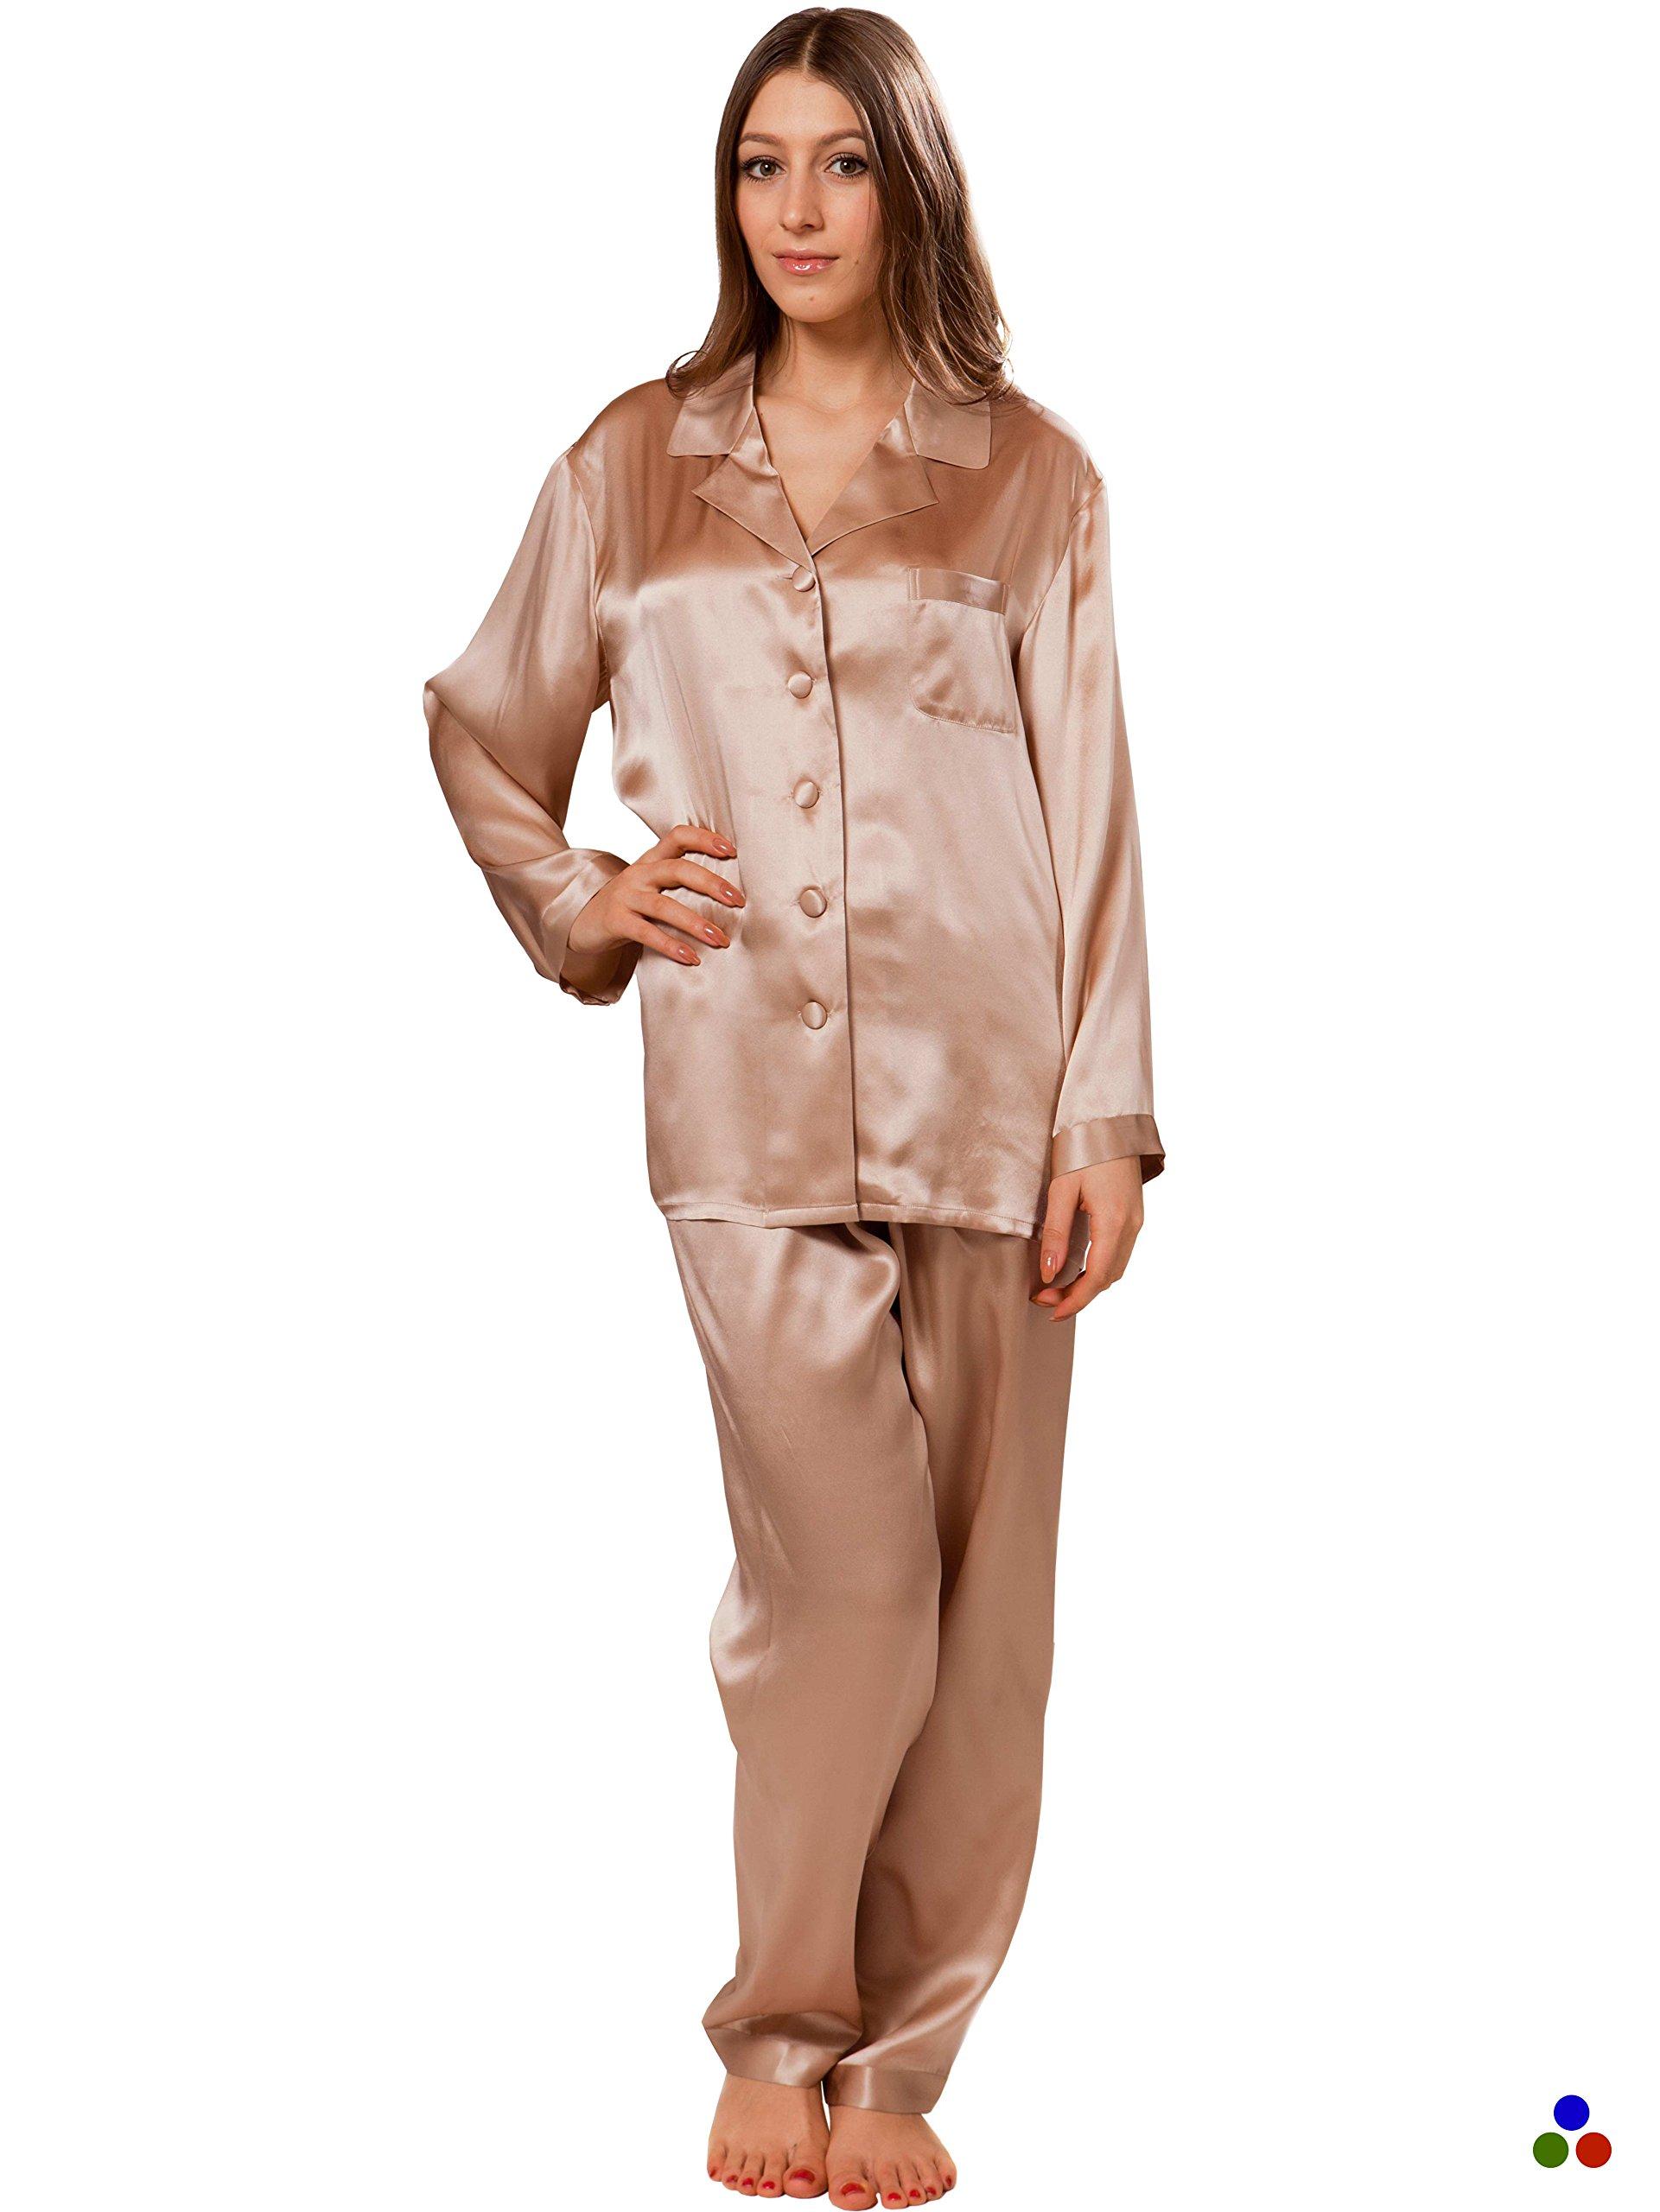 ElleSilk Pajamas for Women, Silk Sleepwear, Long Sleeves Pajama Top and Long Pants, Ultra Soft, Cappuccino, XL